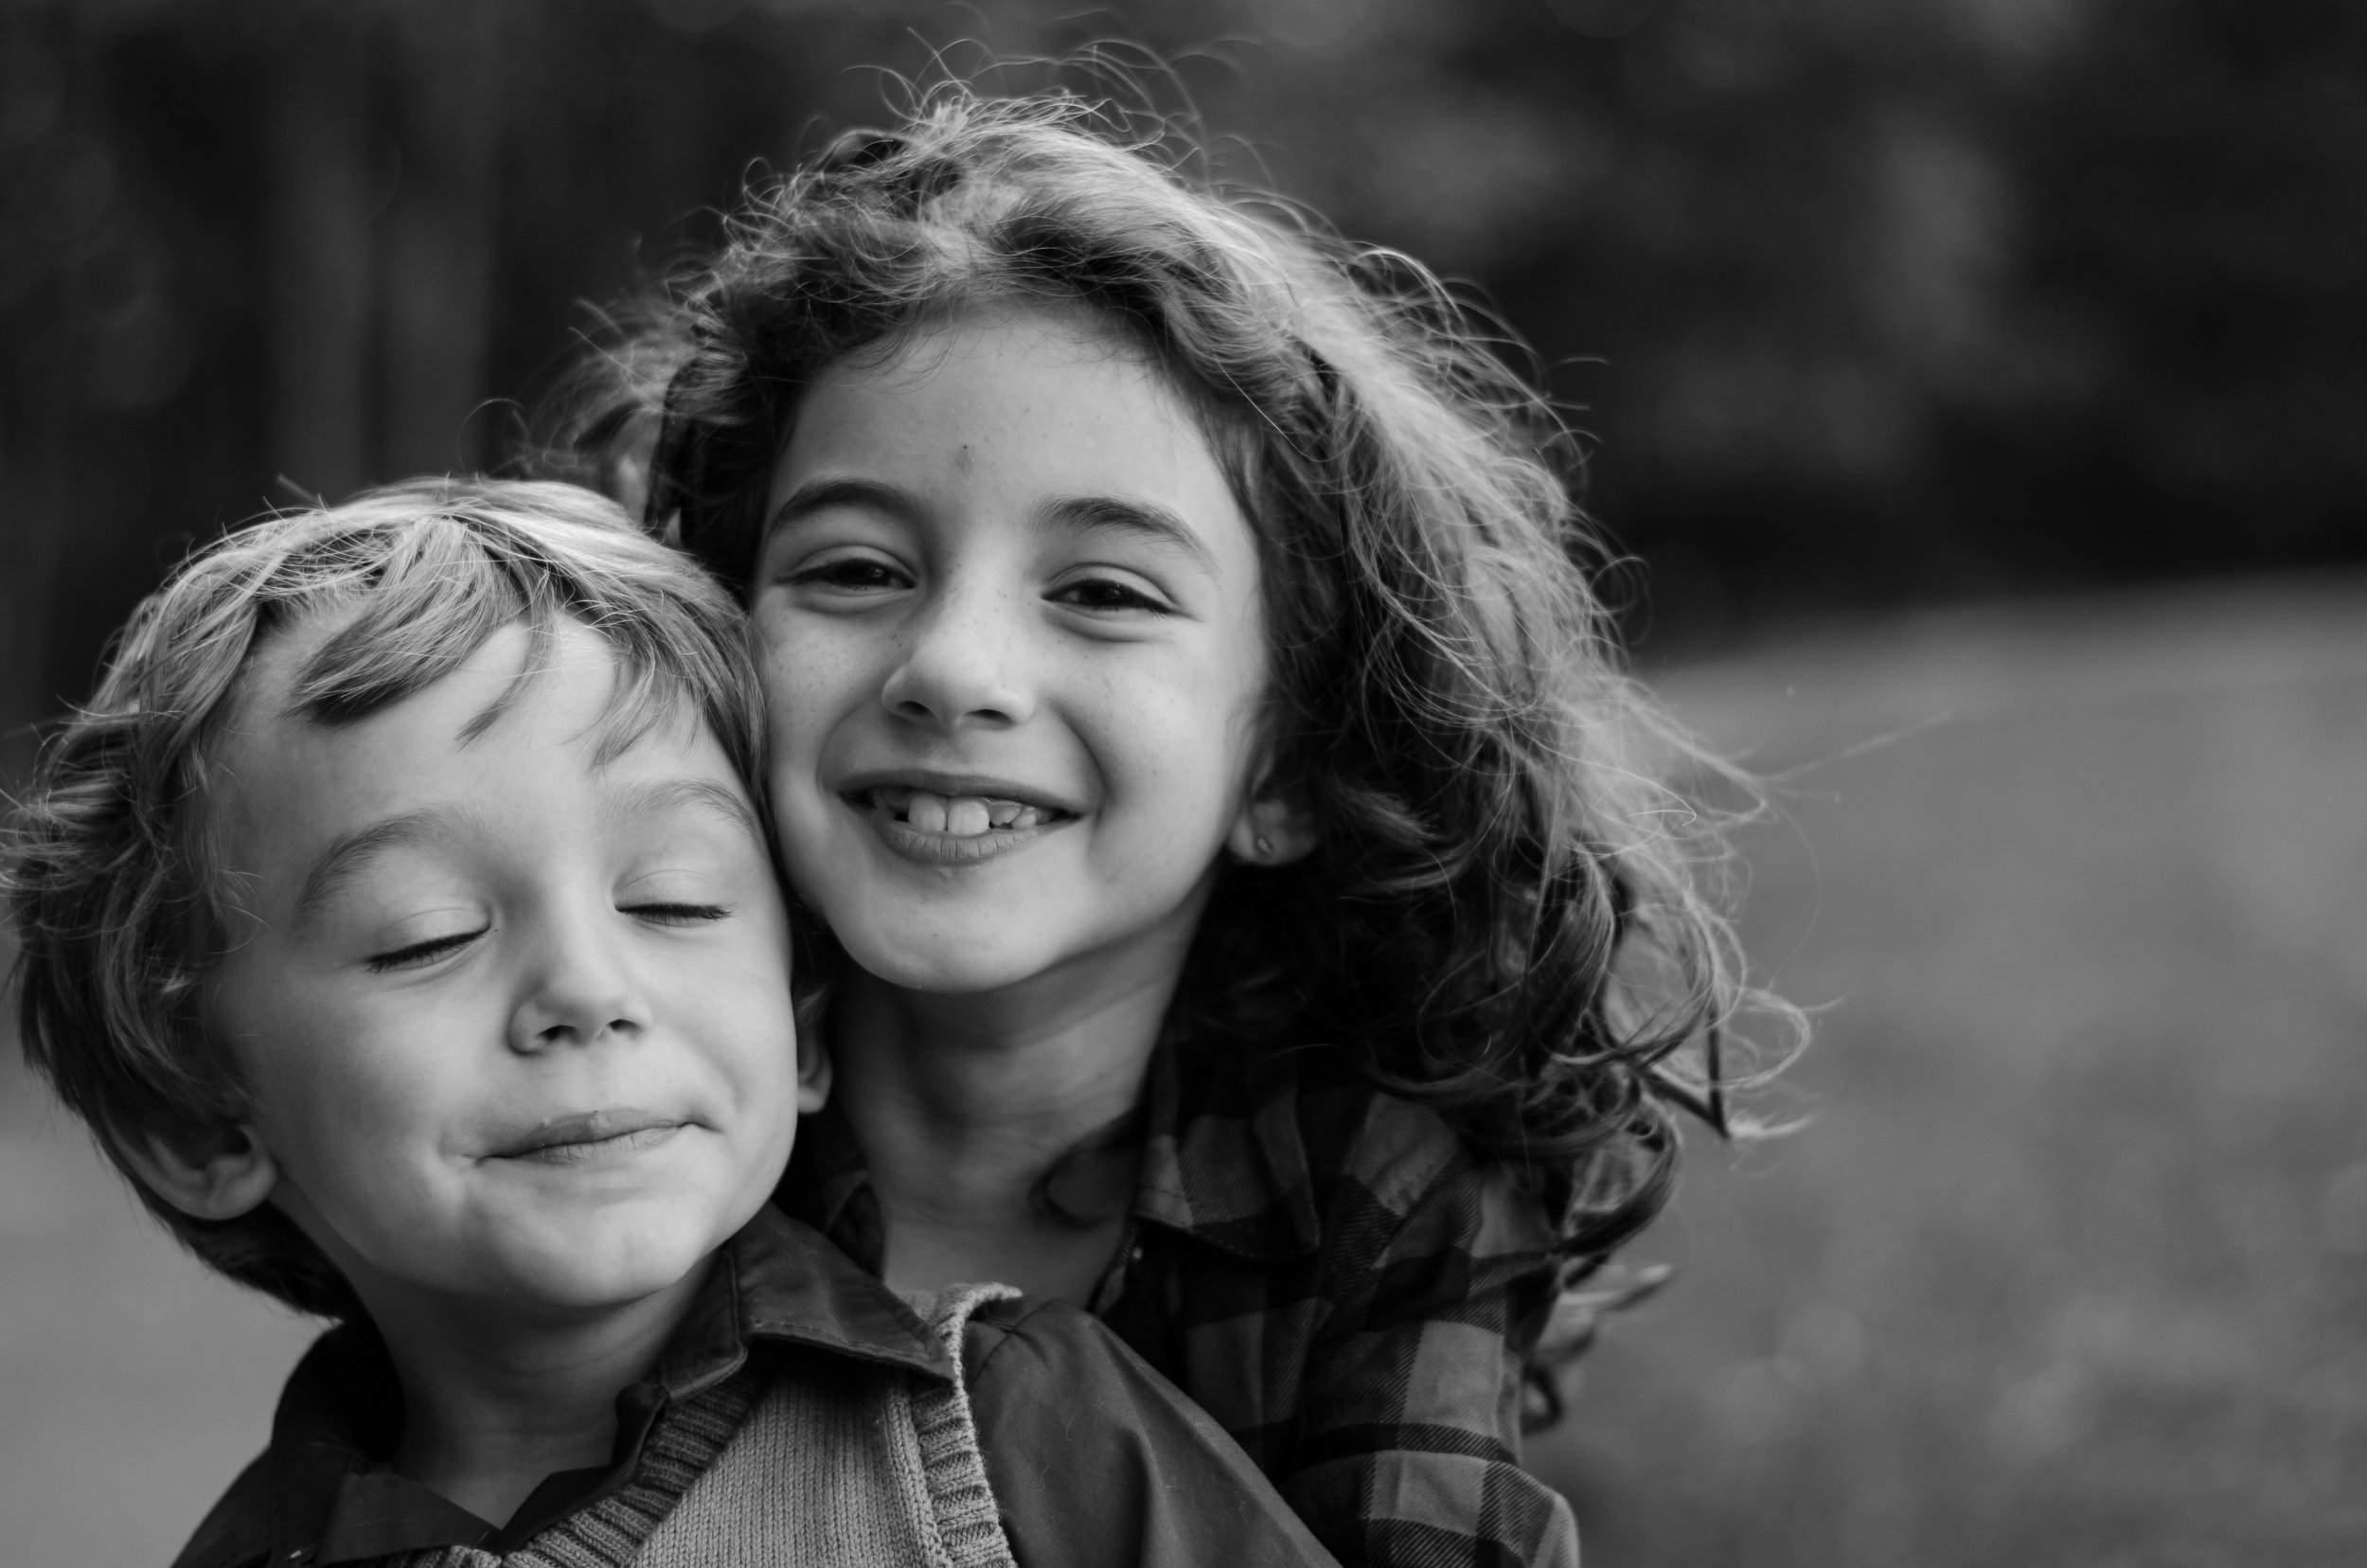 Madison + Thomas children photography